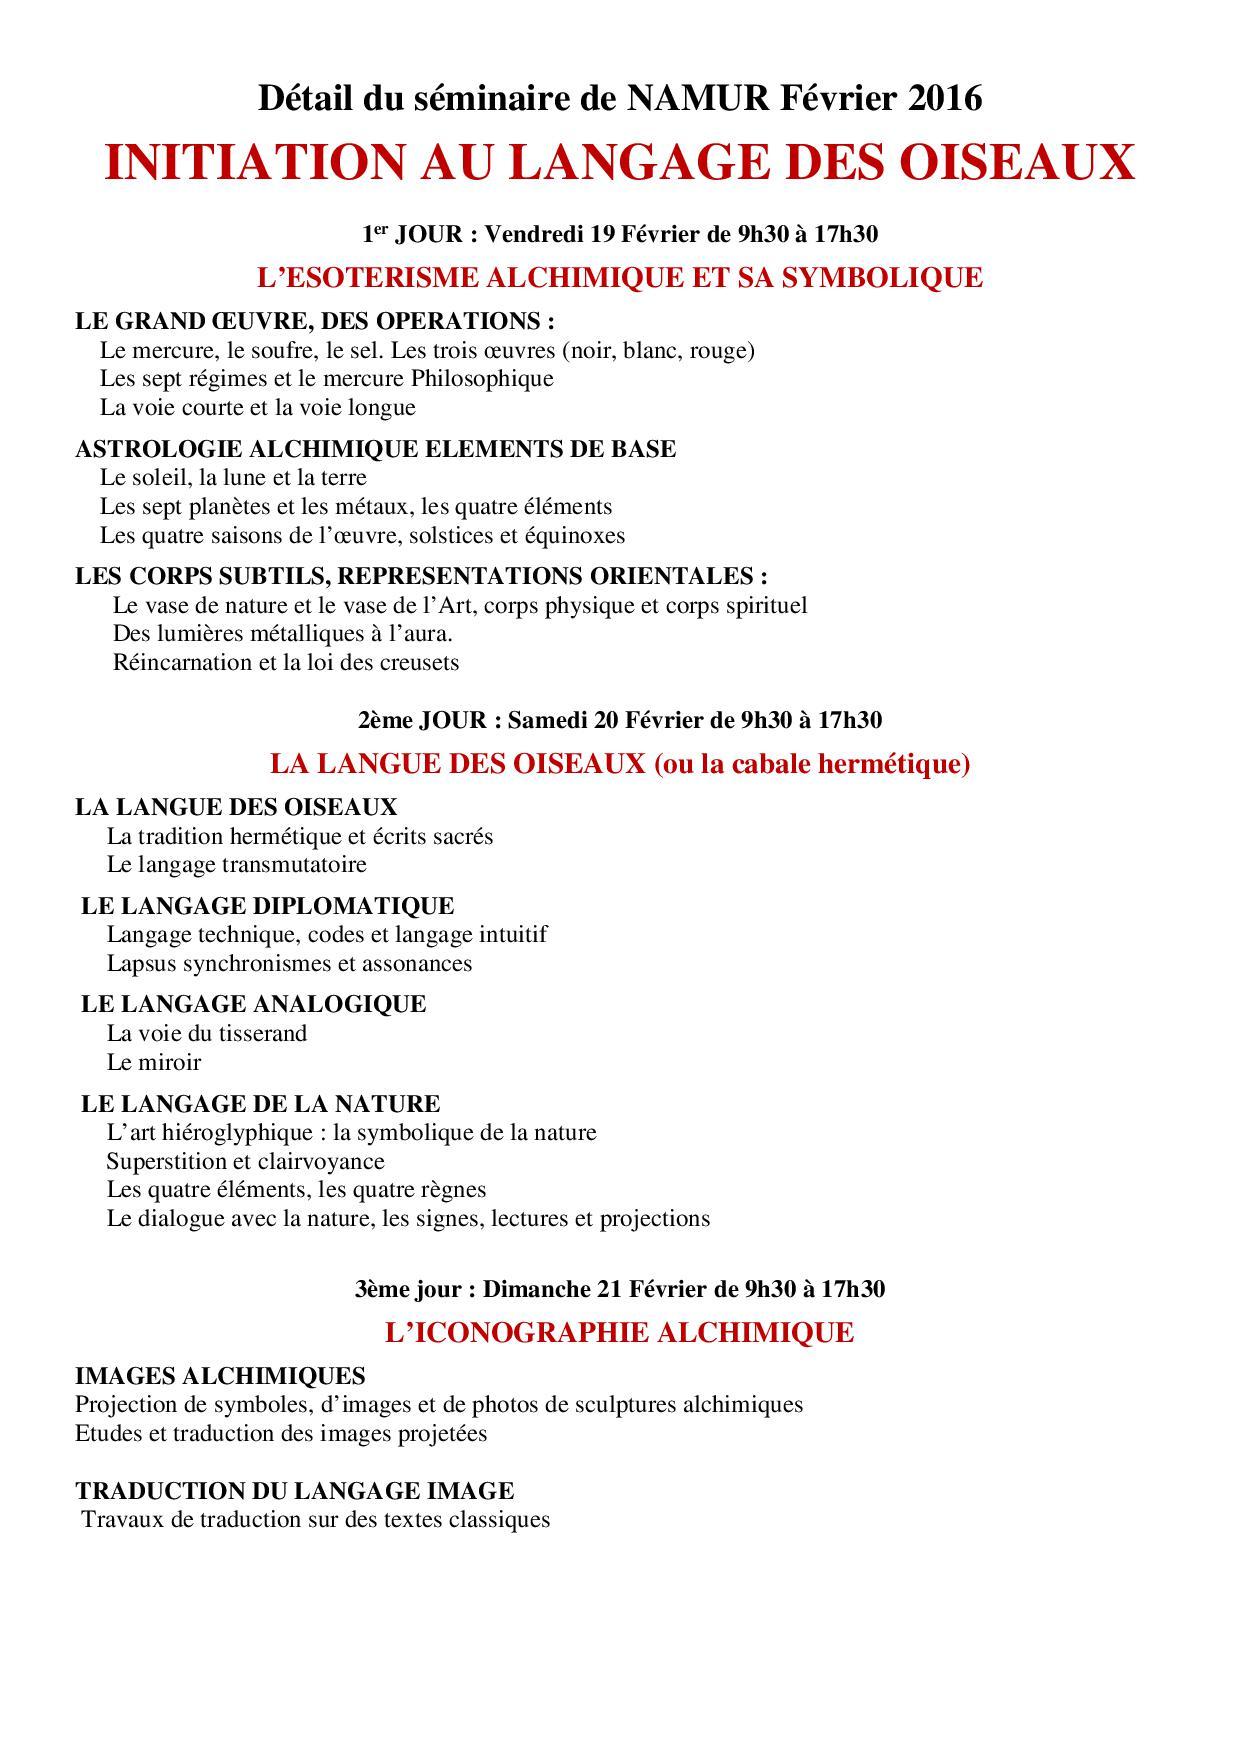 Aff plan seminaire ois namur 02 2016